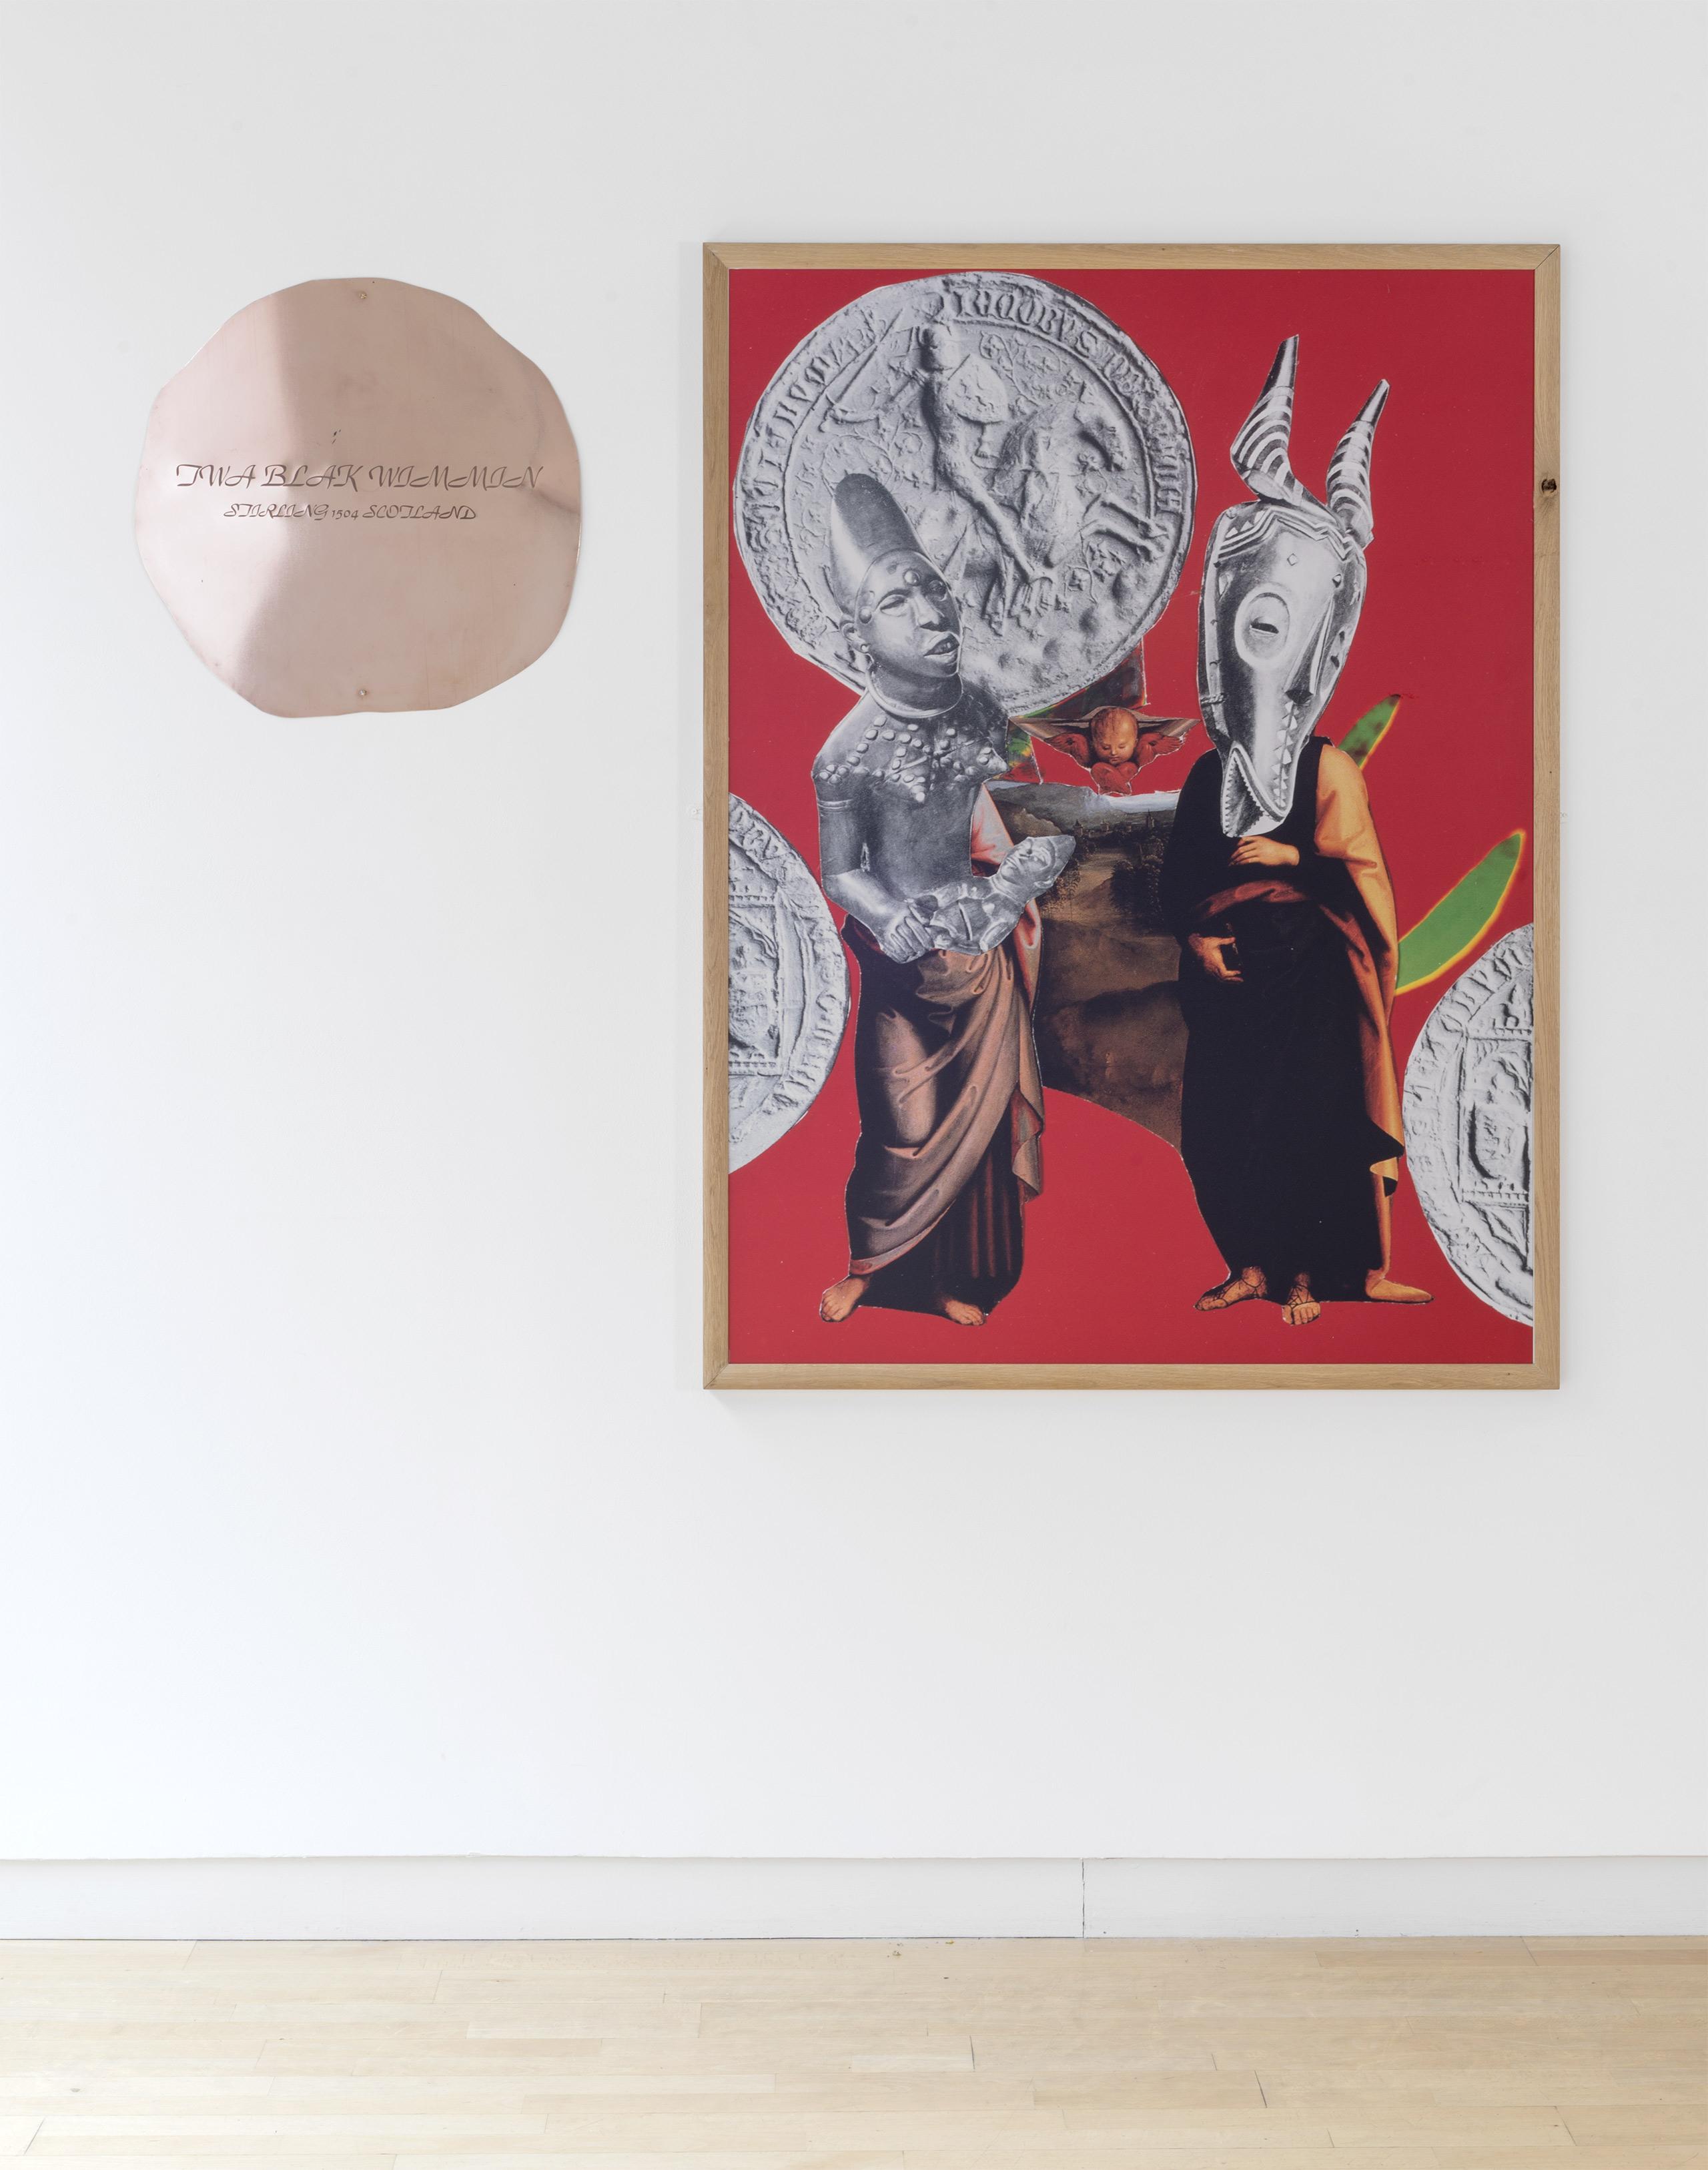 'Twa Blak Wimmin' by Maud Sulter, 1996/7